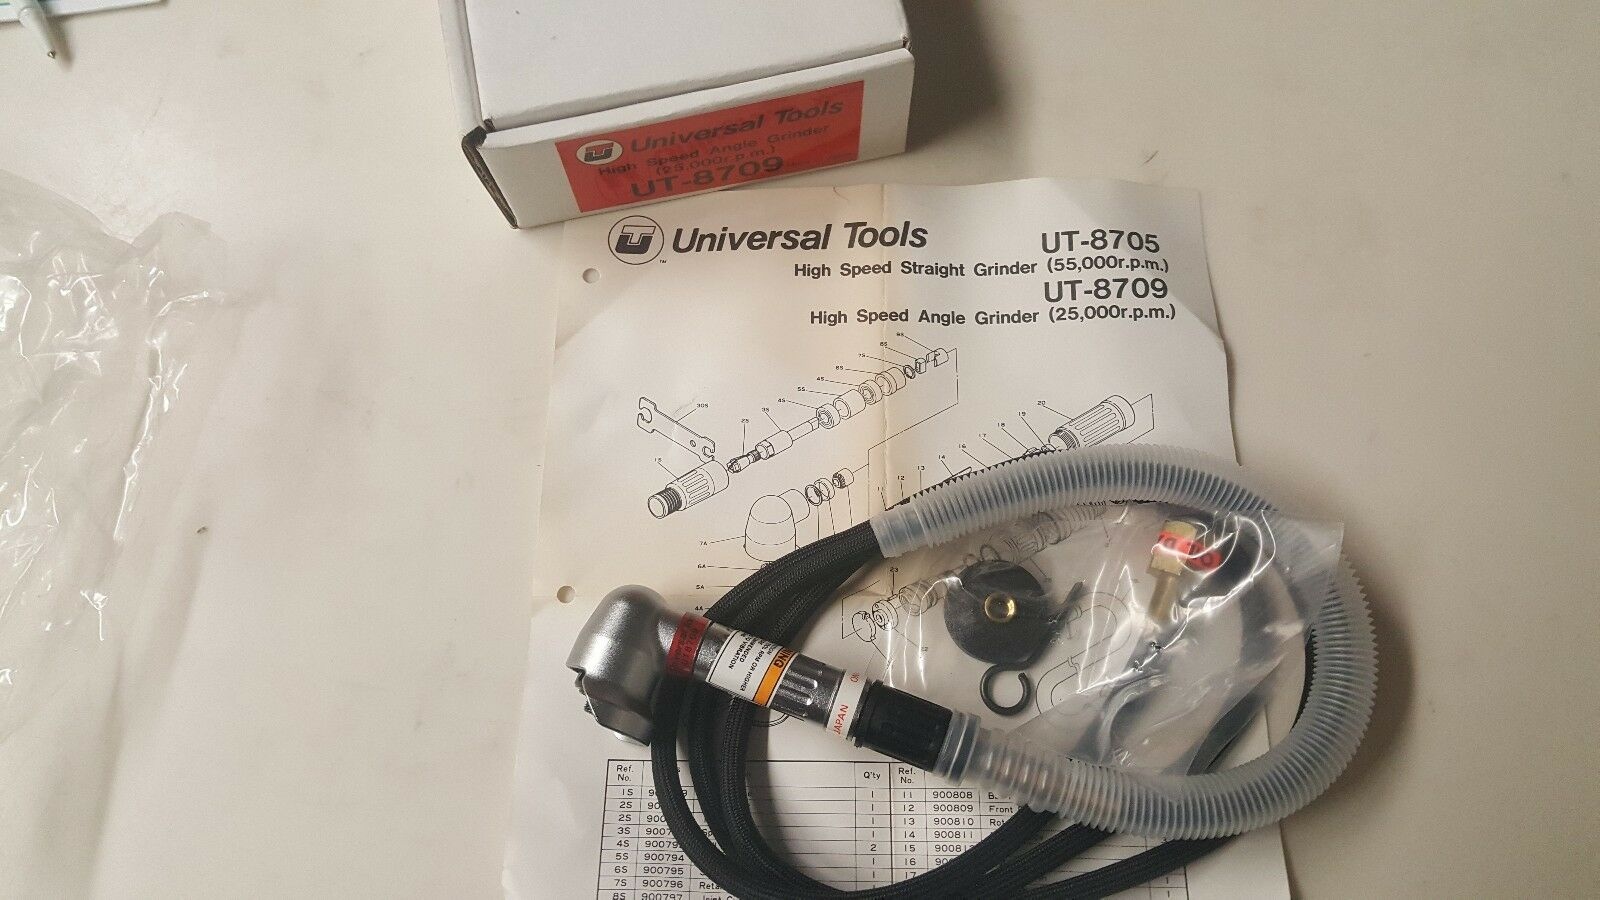 New Universal Universal Universal Tool High Speed Angle Grinder 33dc4e